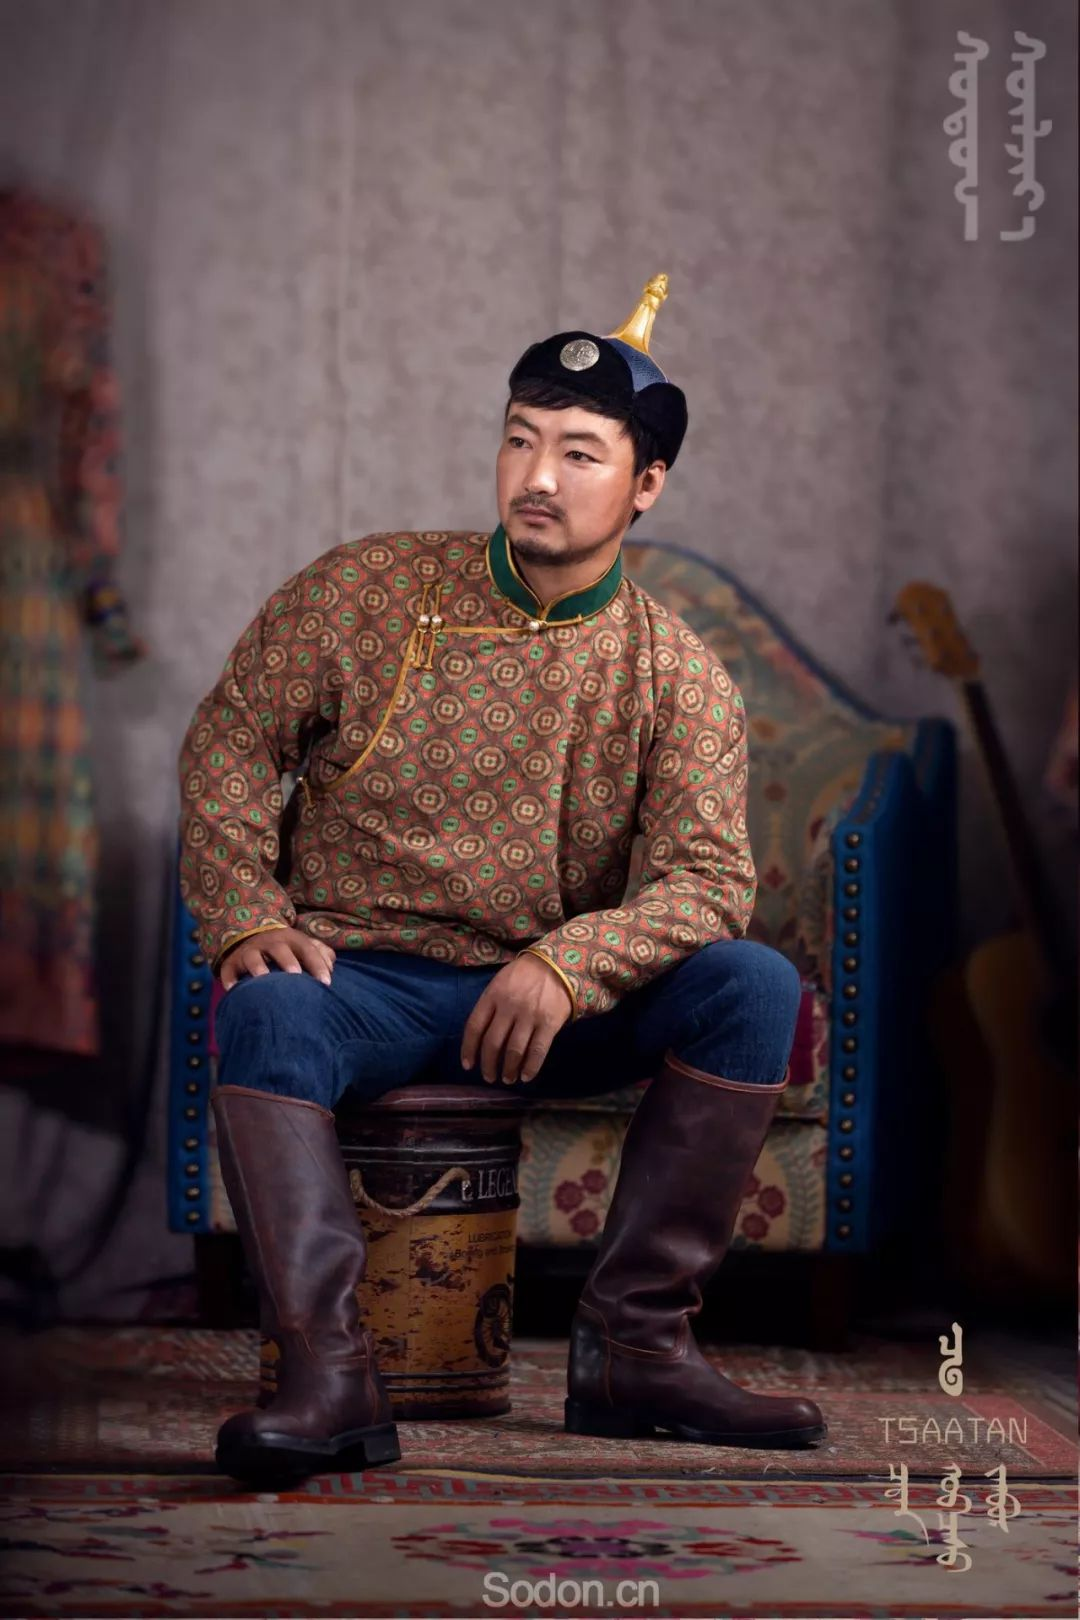 TSAATAN蒙古时装 2019夏季新款首发 第13张